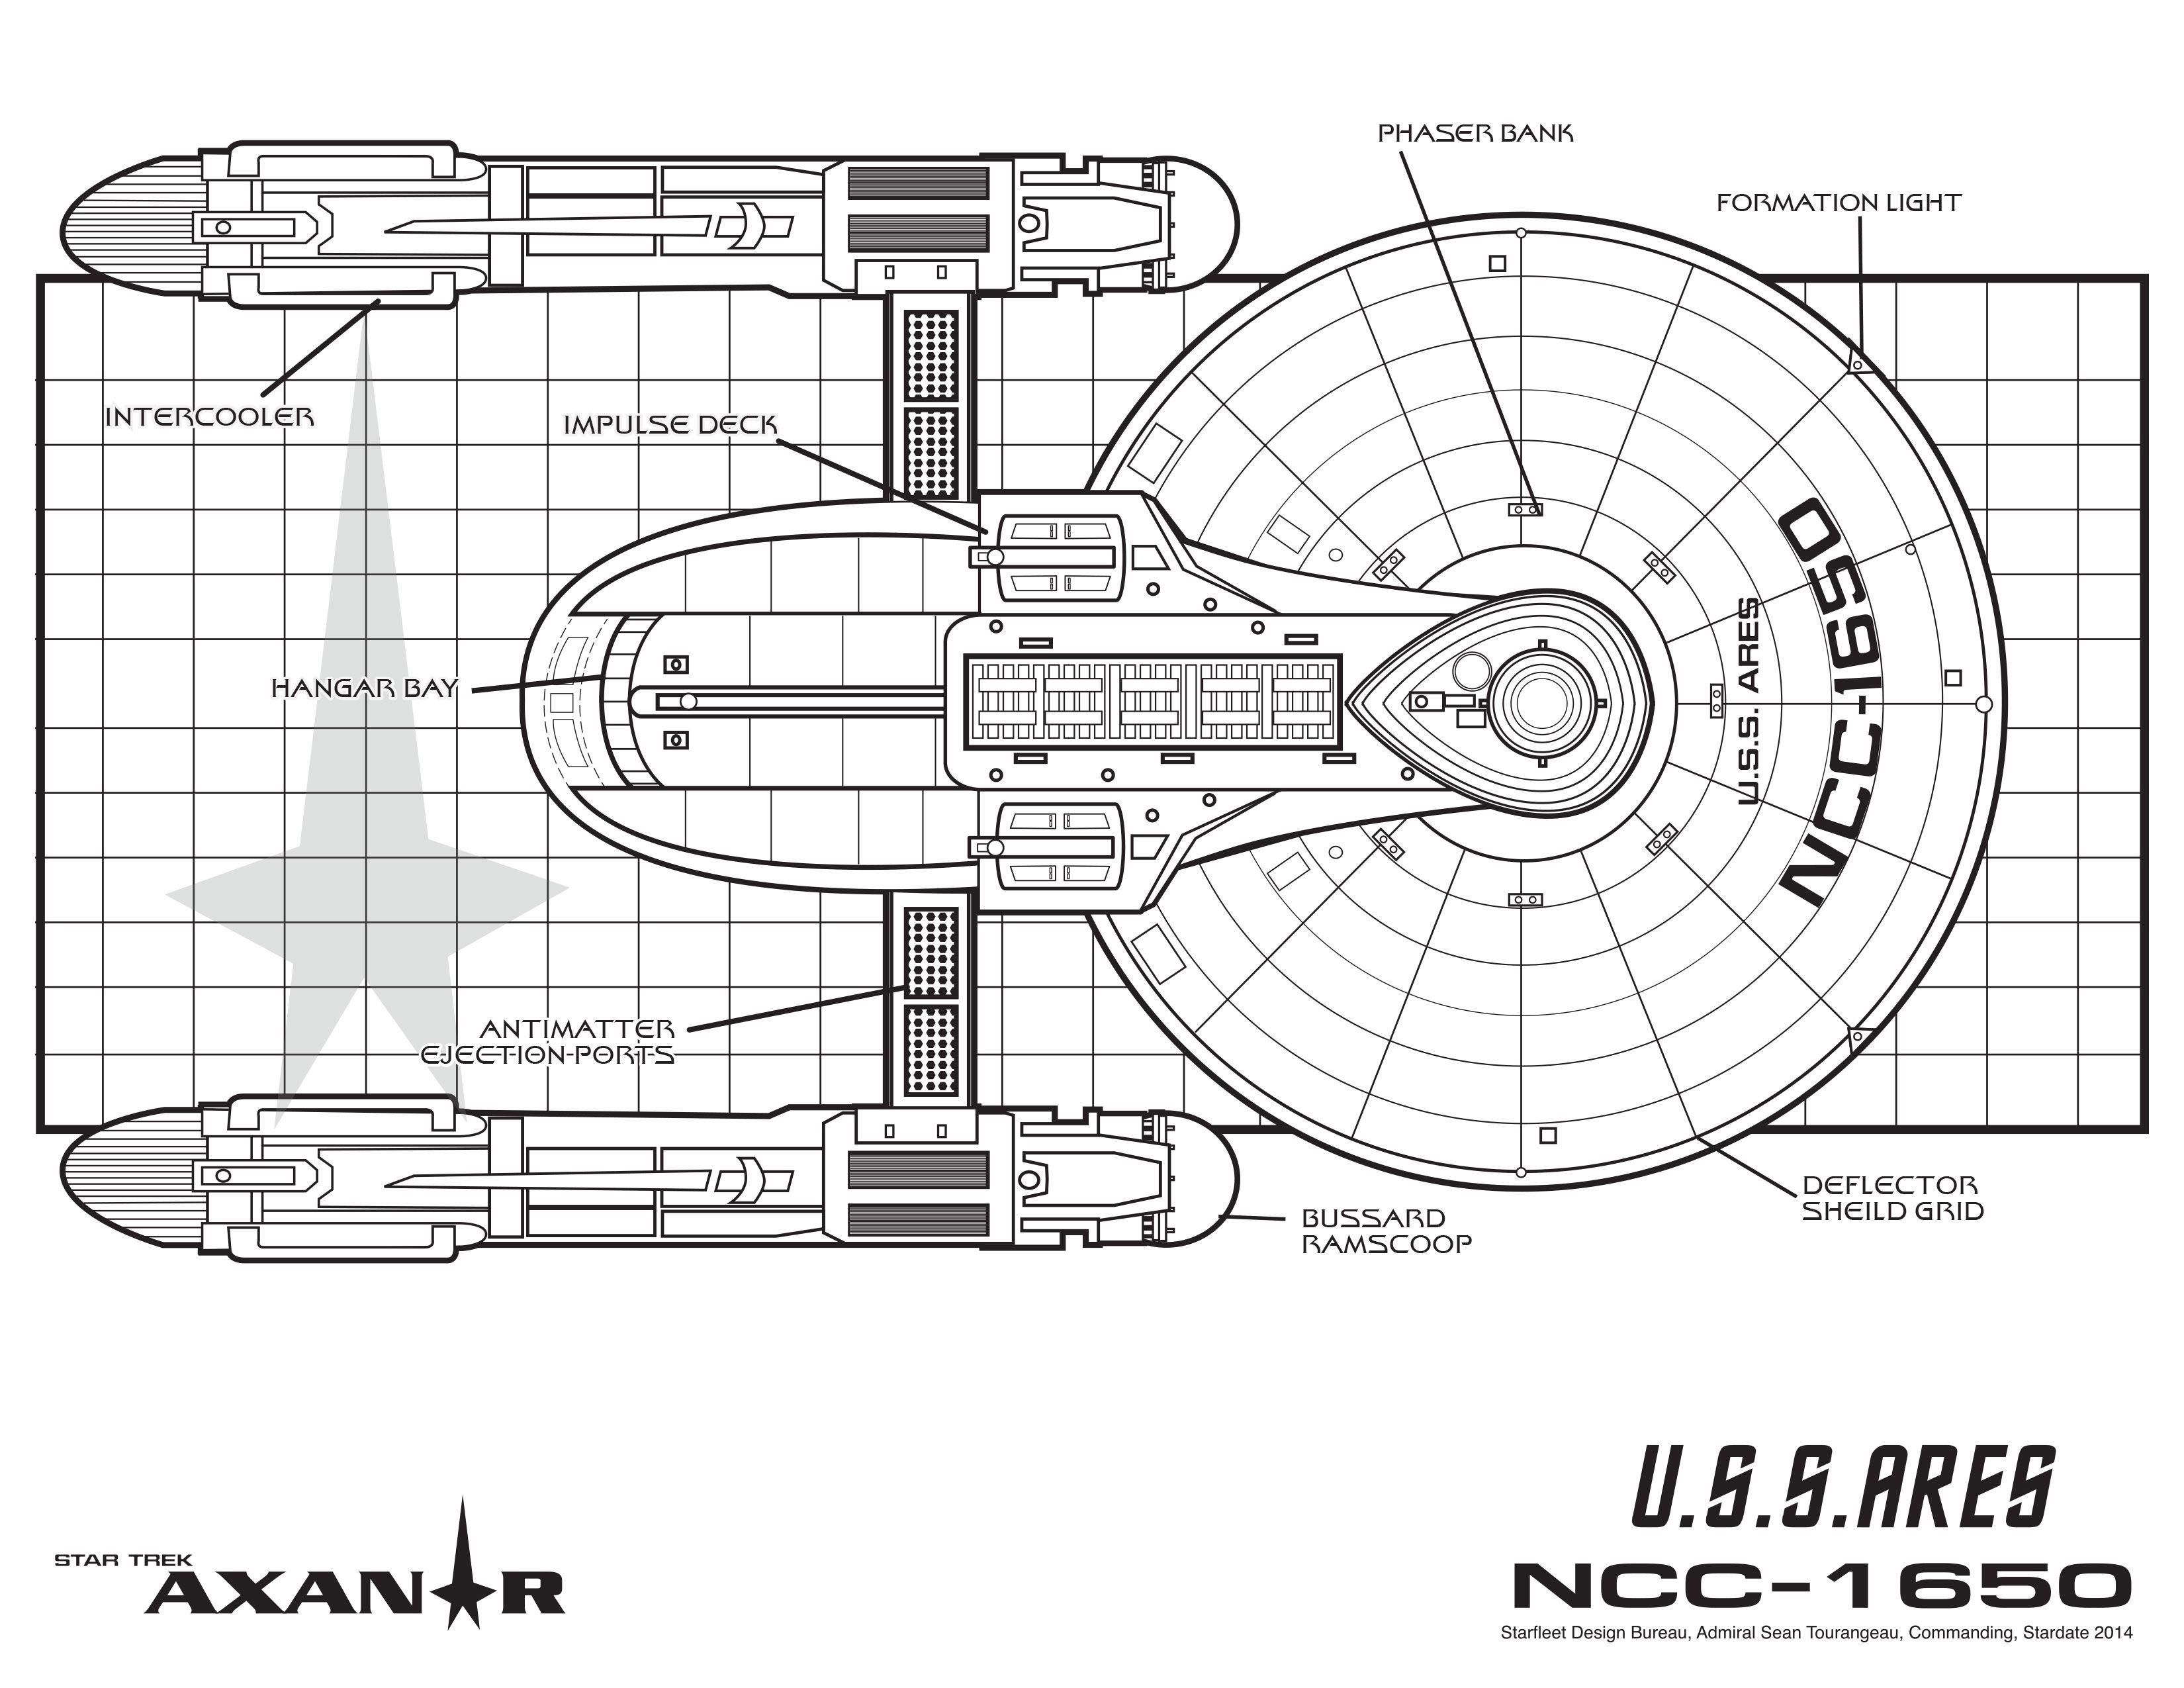 U S S Ares Ncc Star Trek Axanar